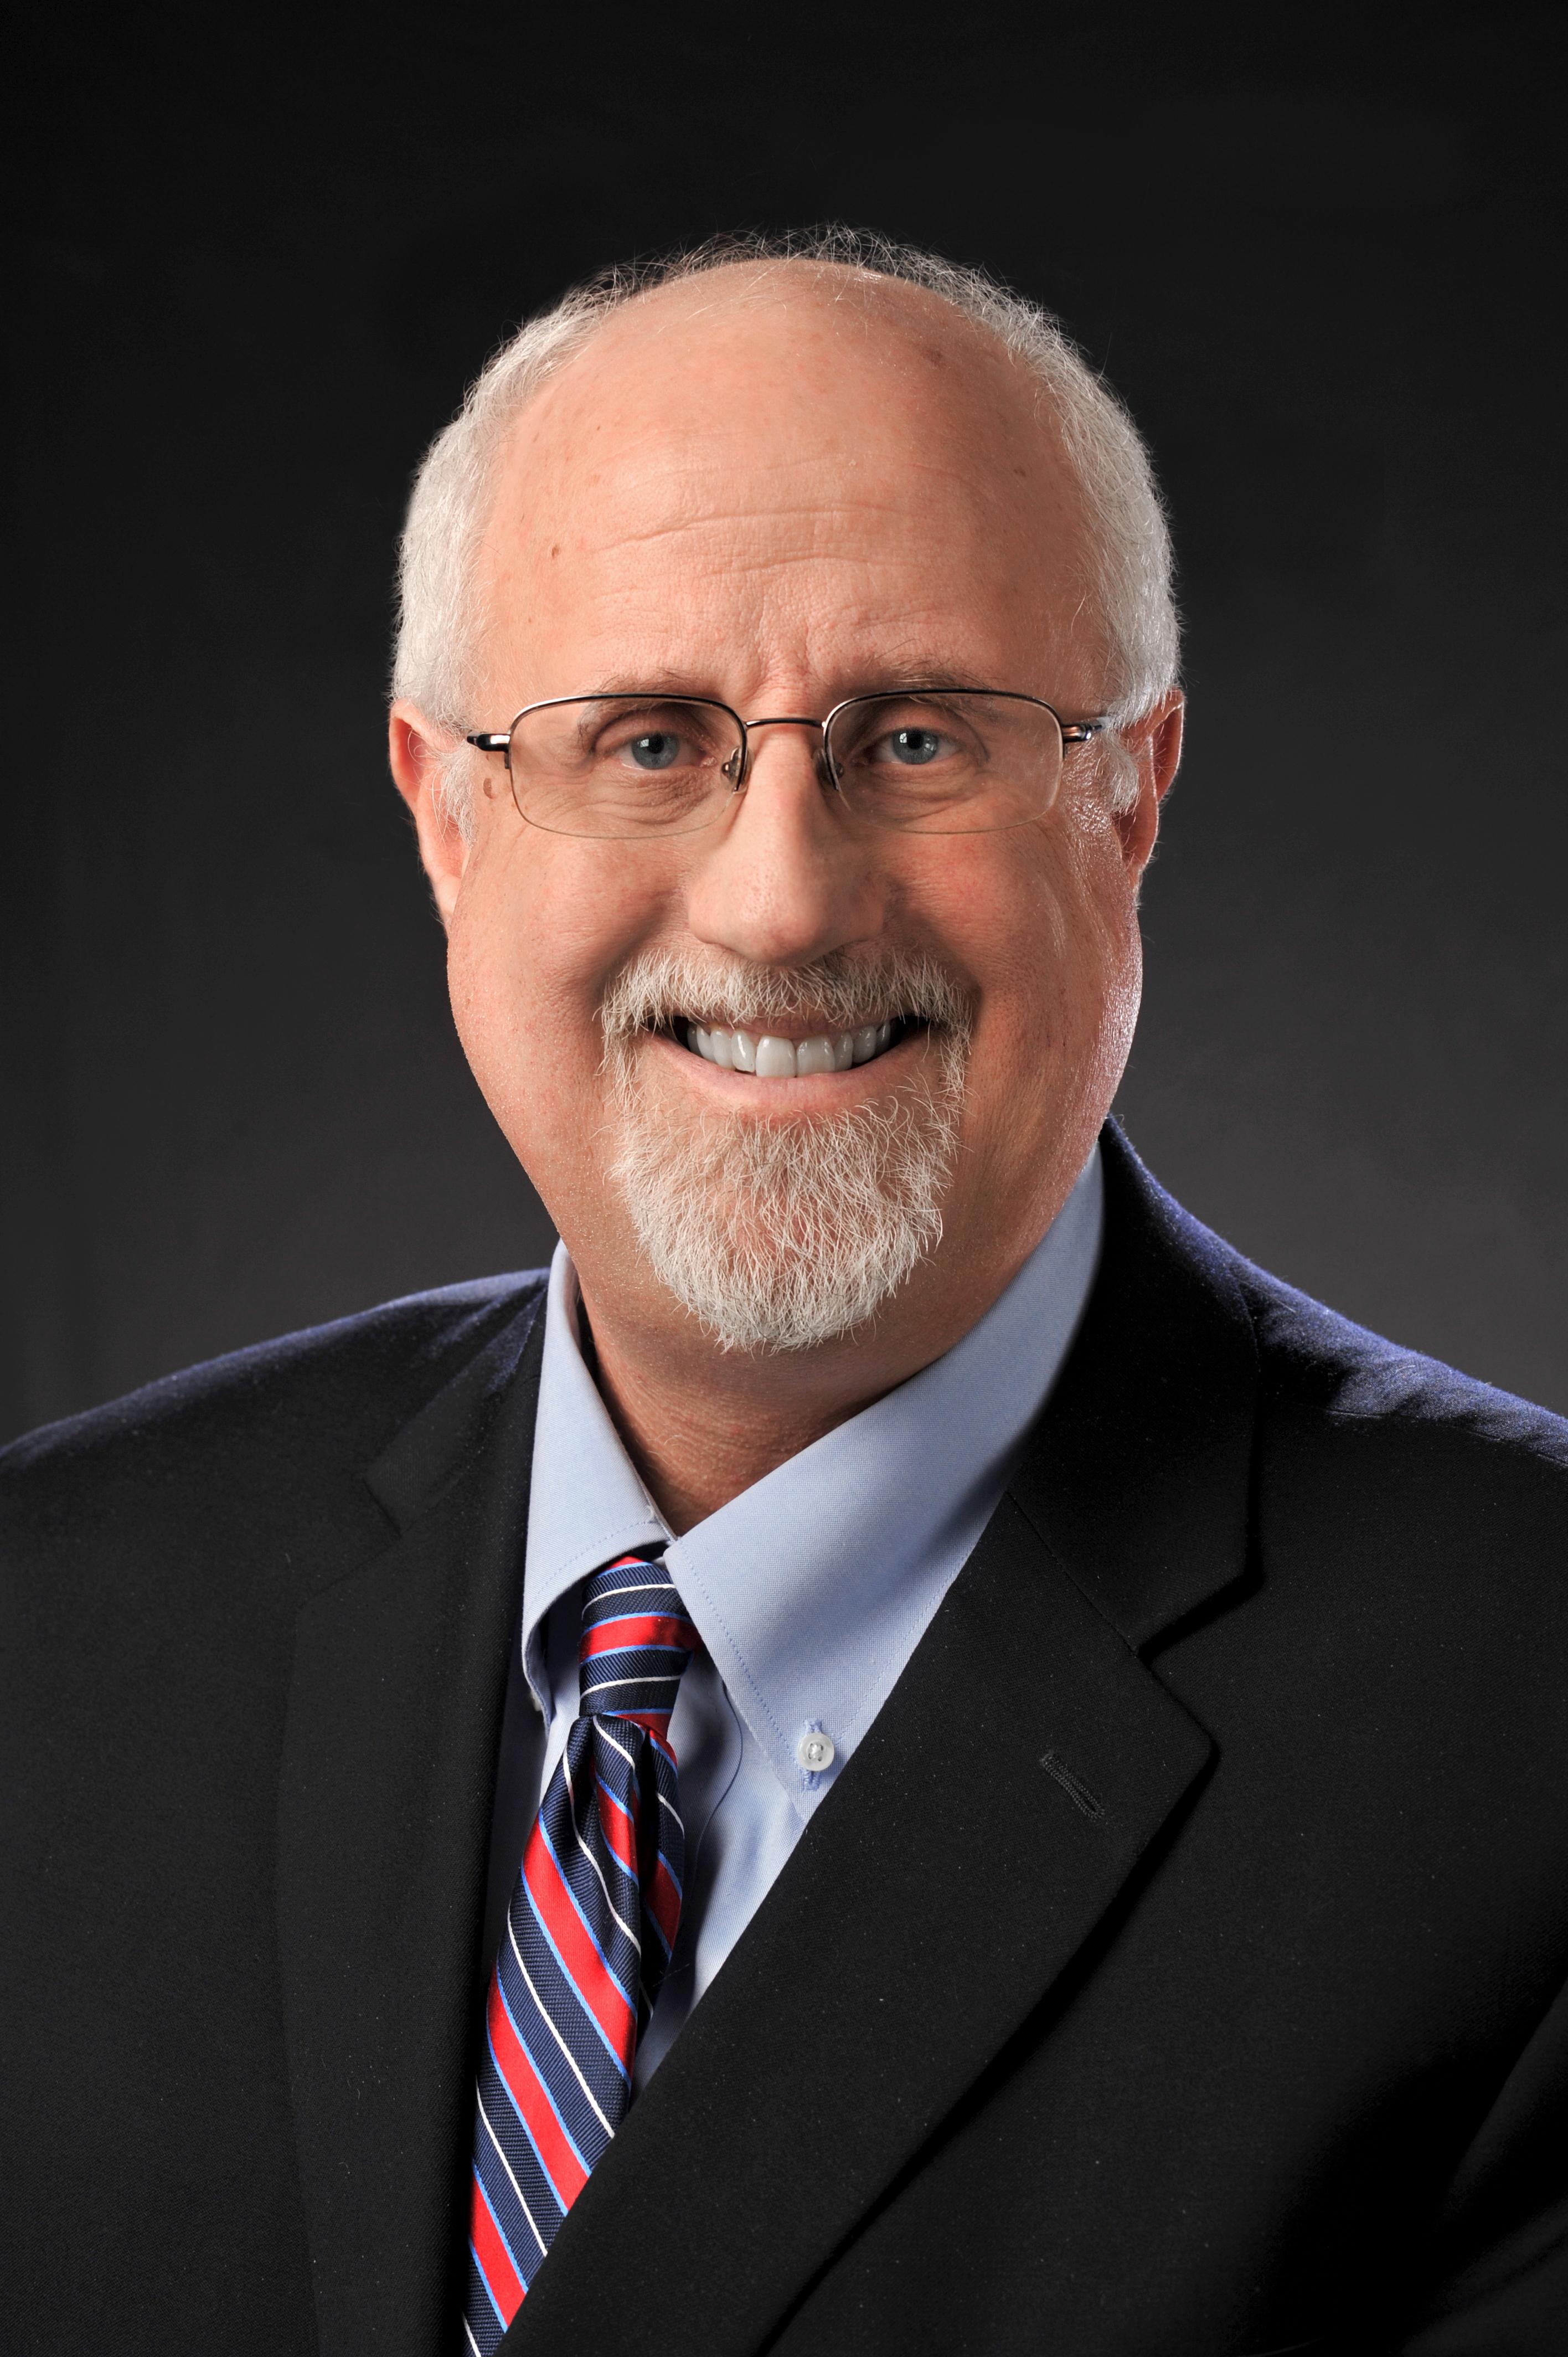 Dr. Pat Breysse of the CDC